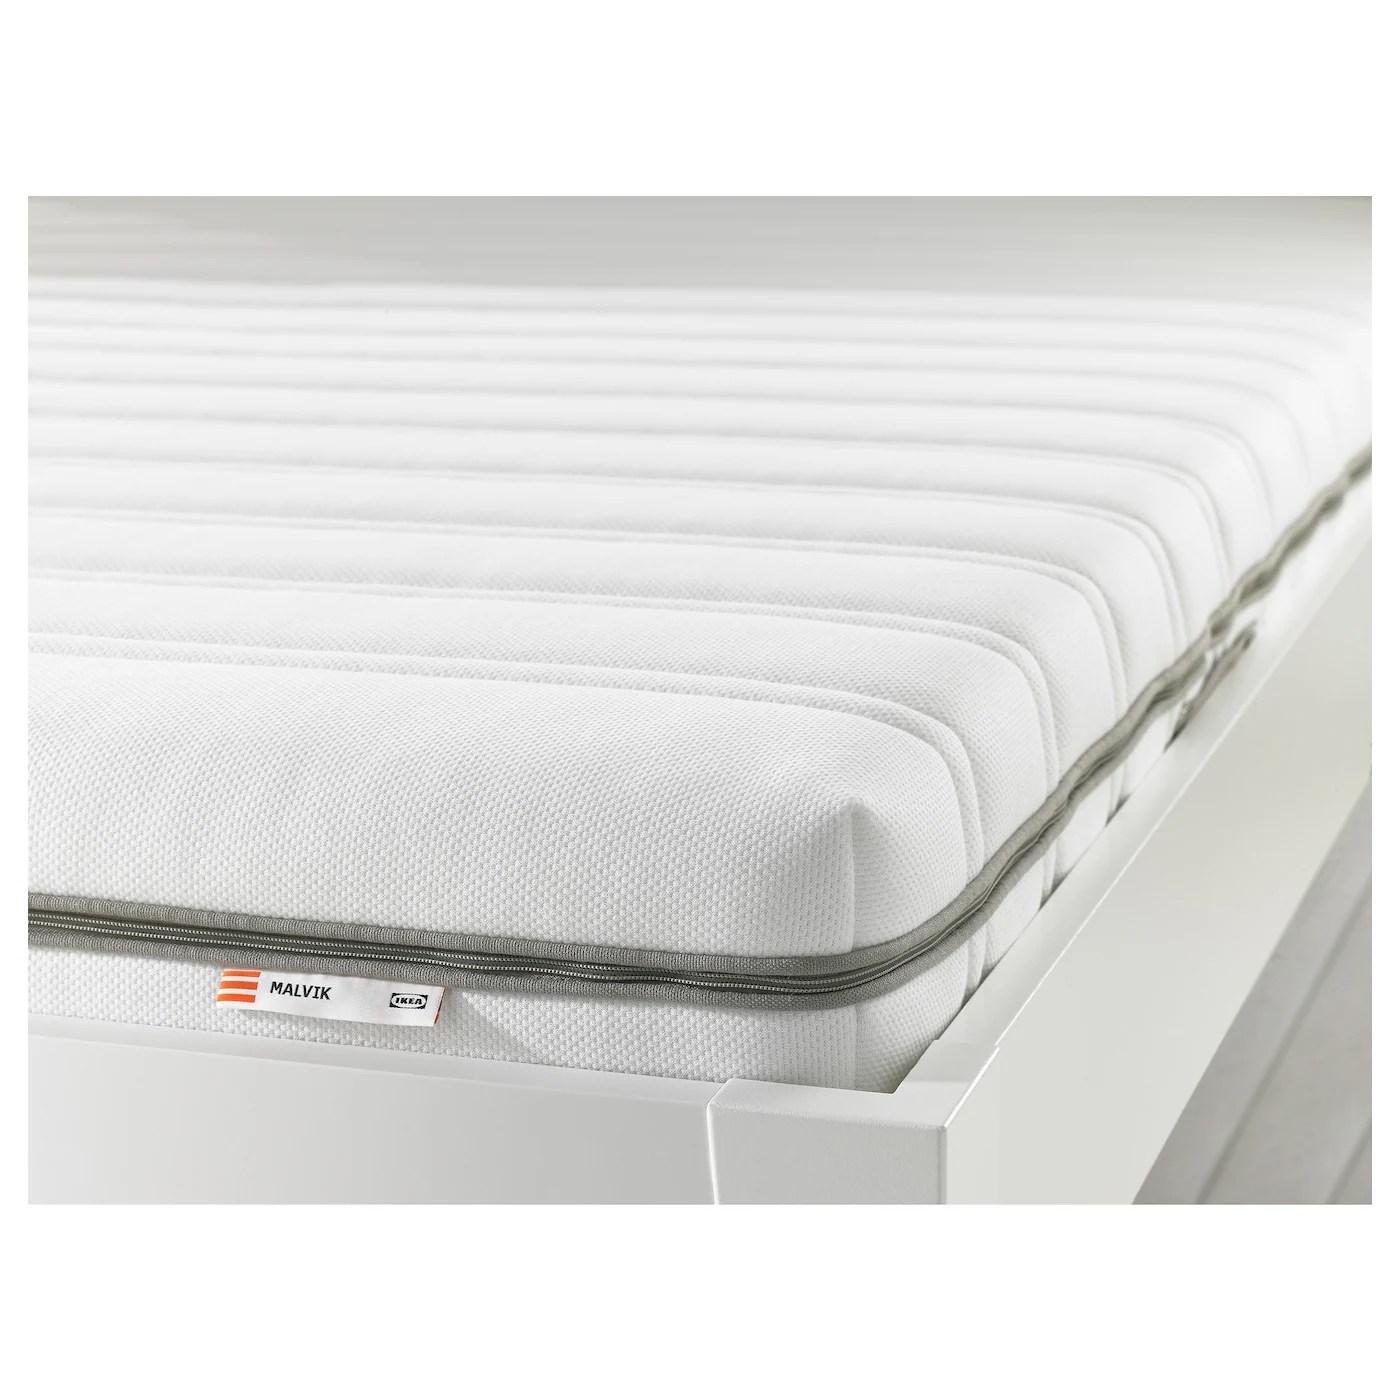 Malvik Foam Mattress Firm White 80x200 Cm Ikea